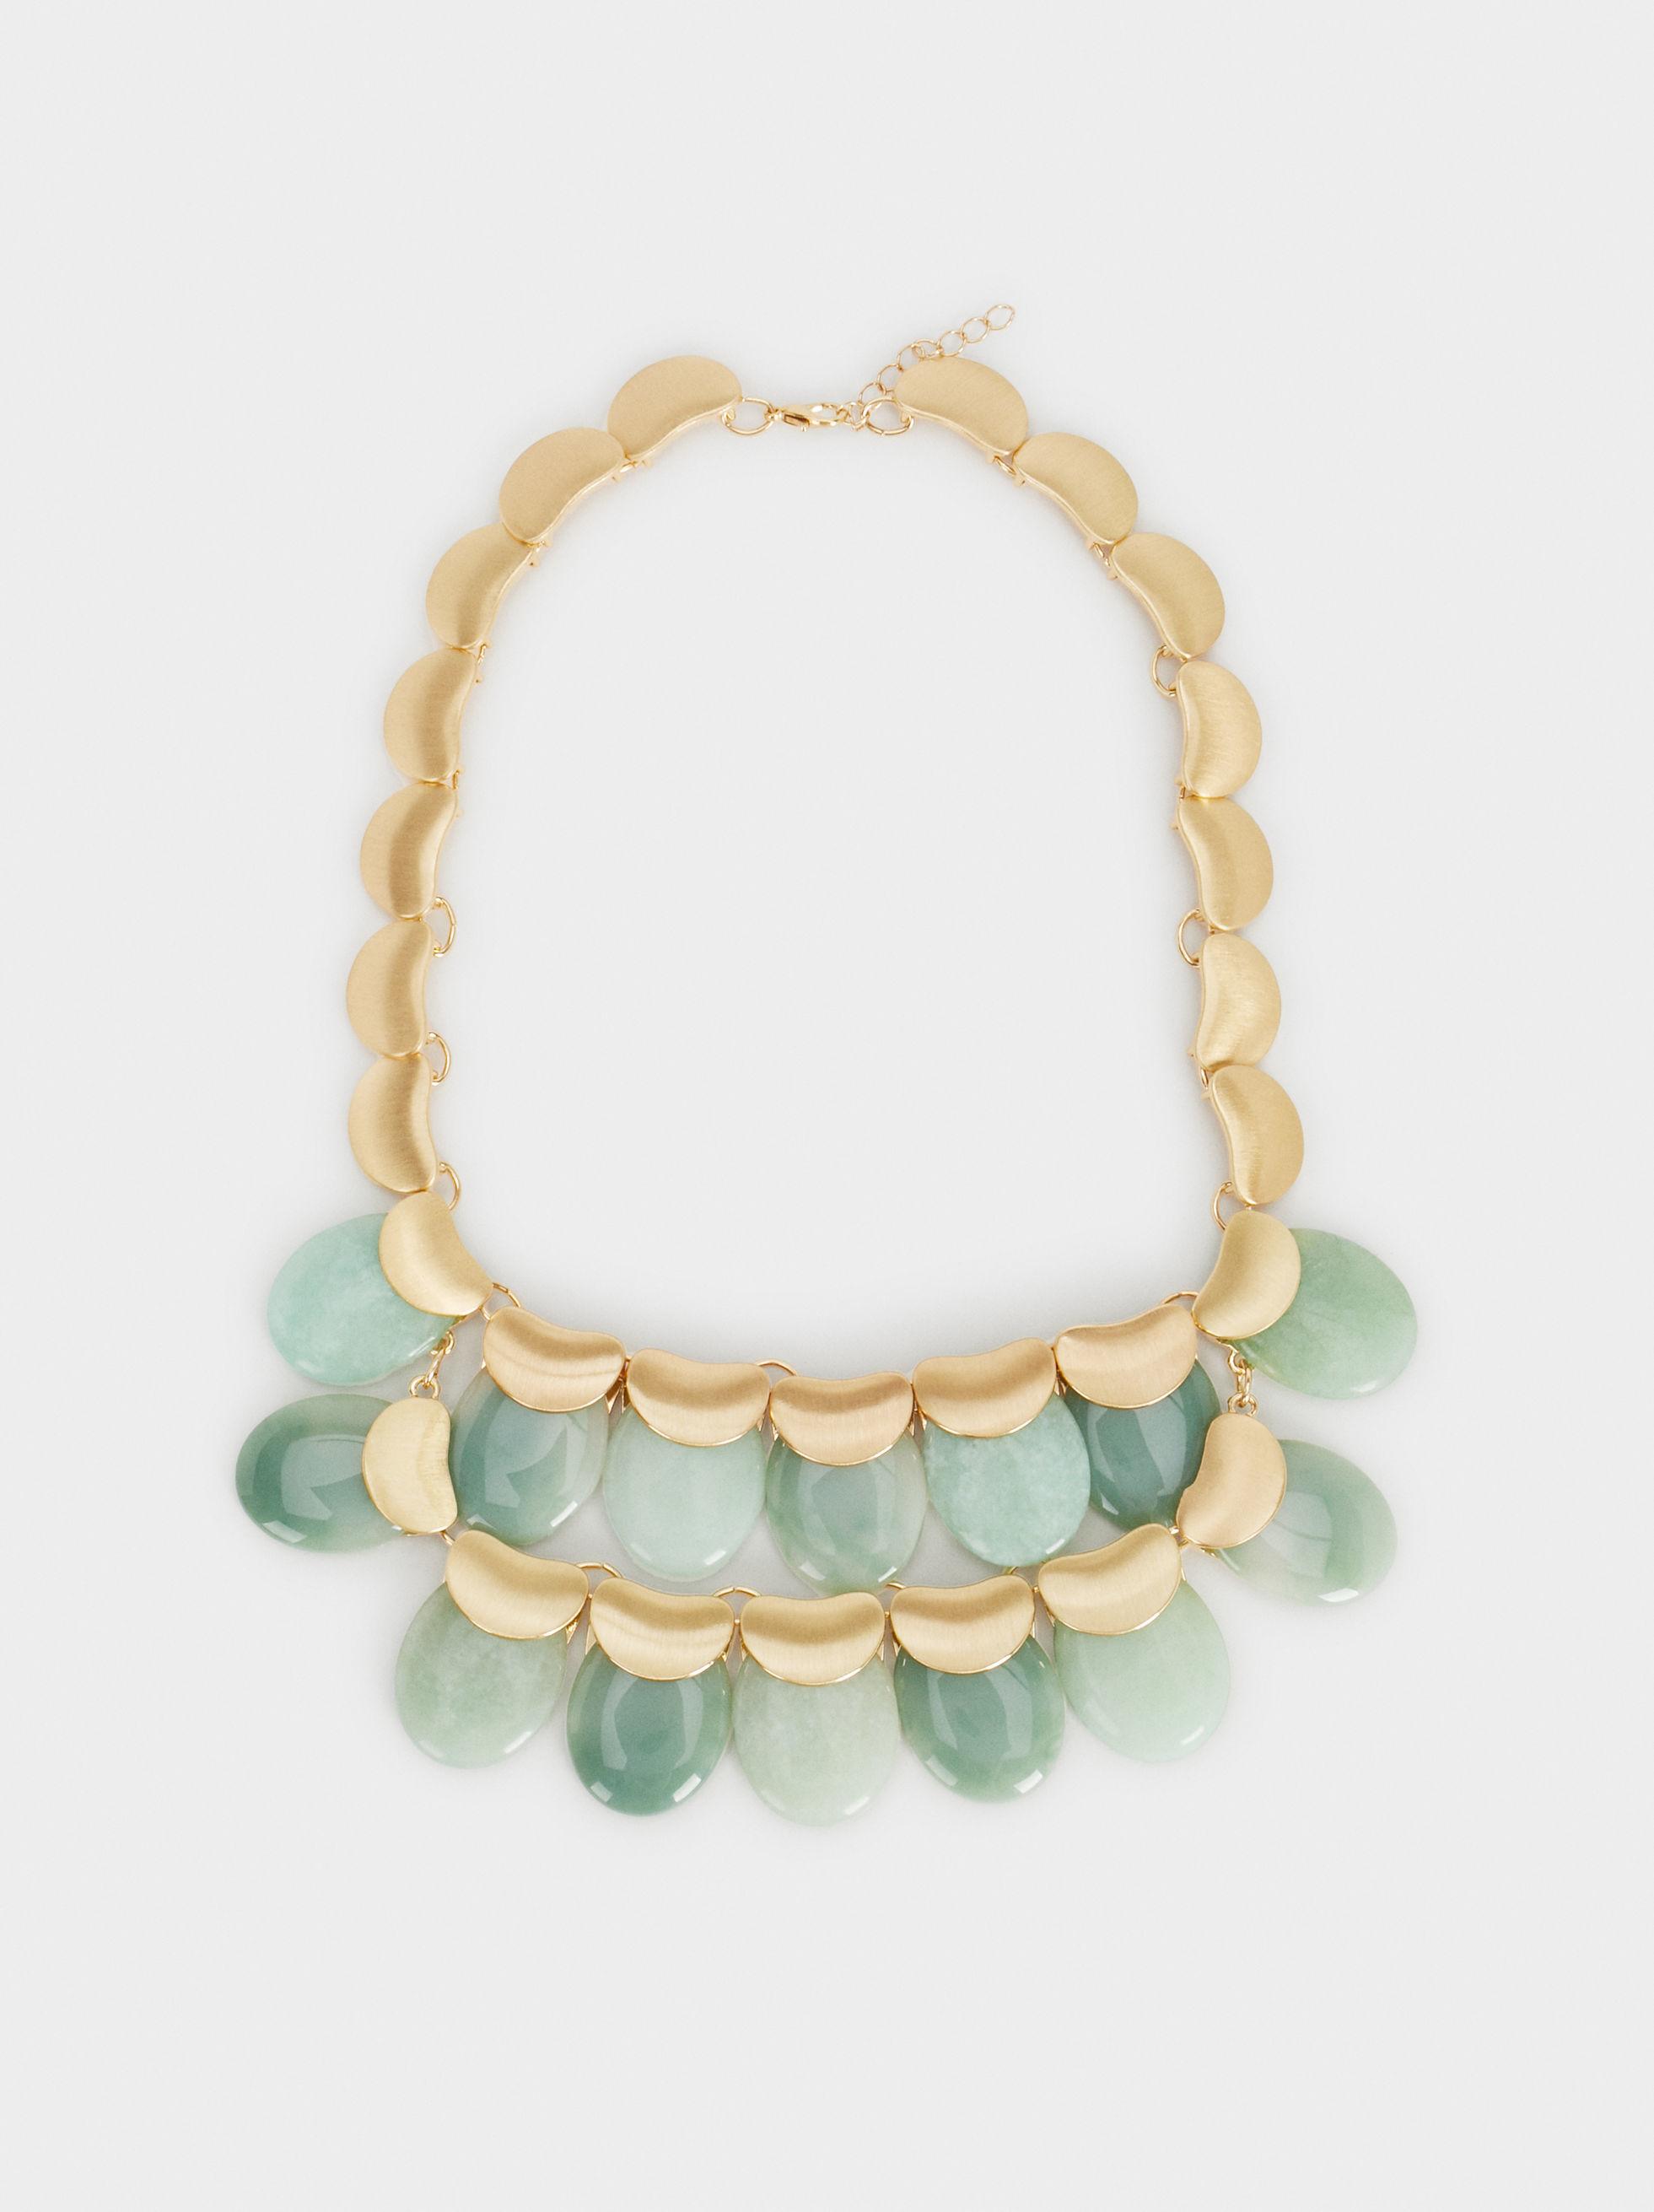 Collar con piedras verdes en dorado de Parfois